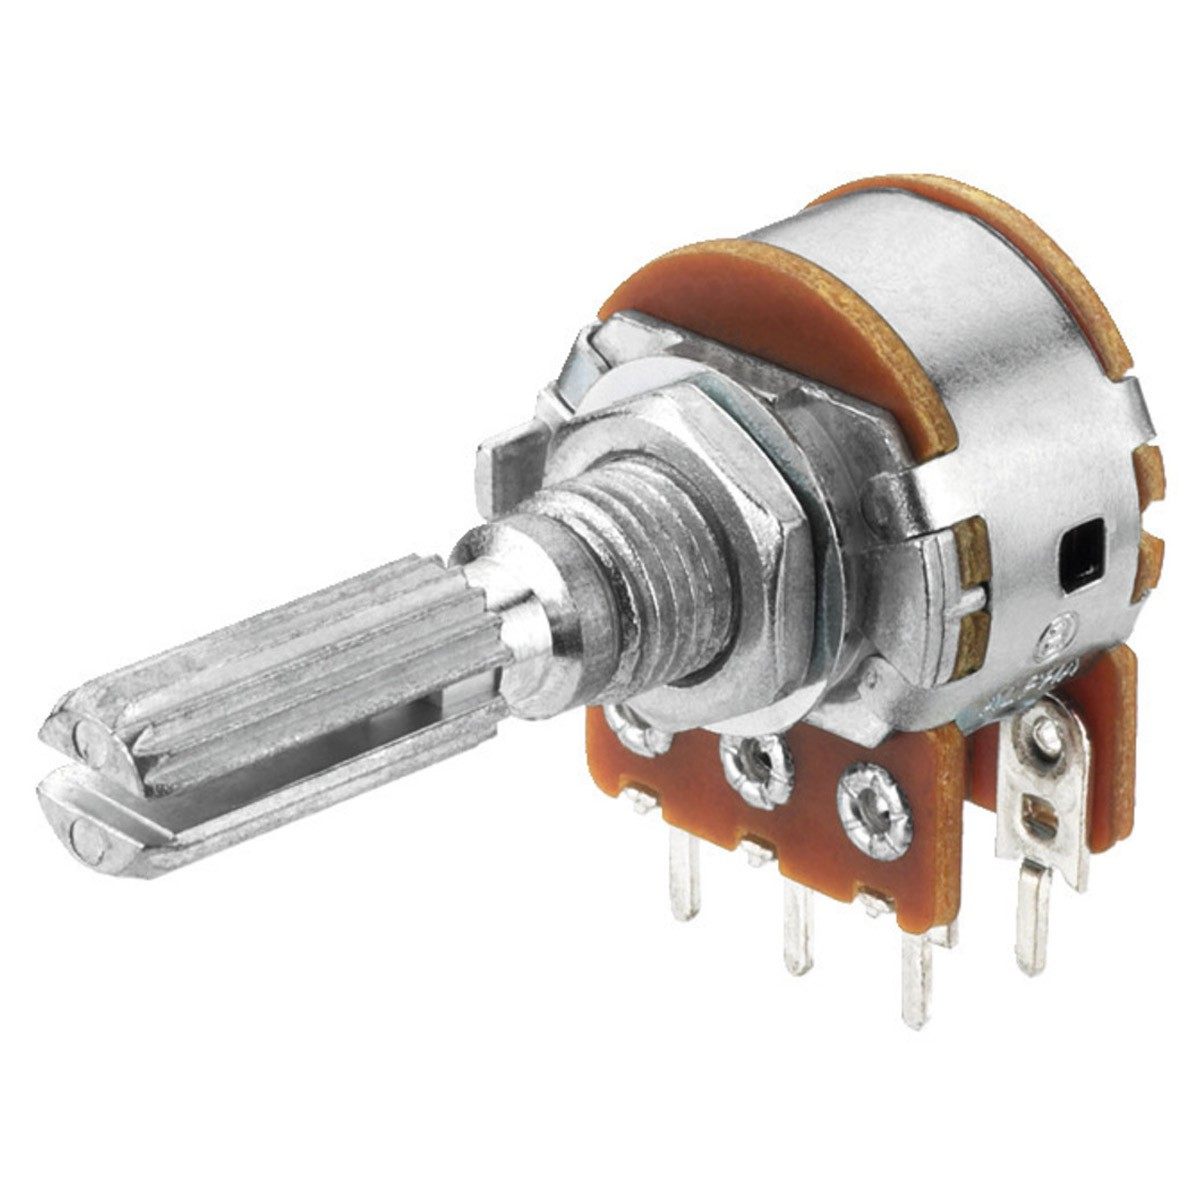 Stereo potentiometer VRB-100S50 50k ohm